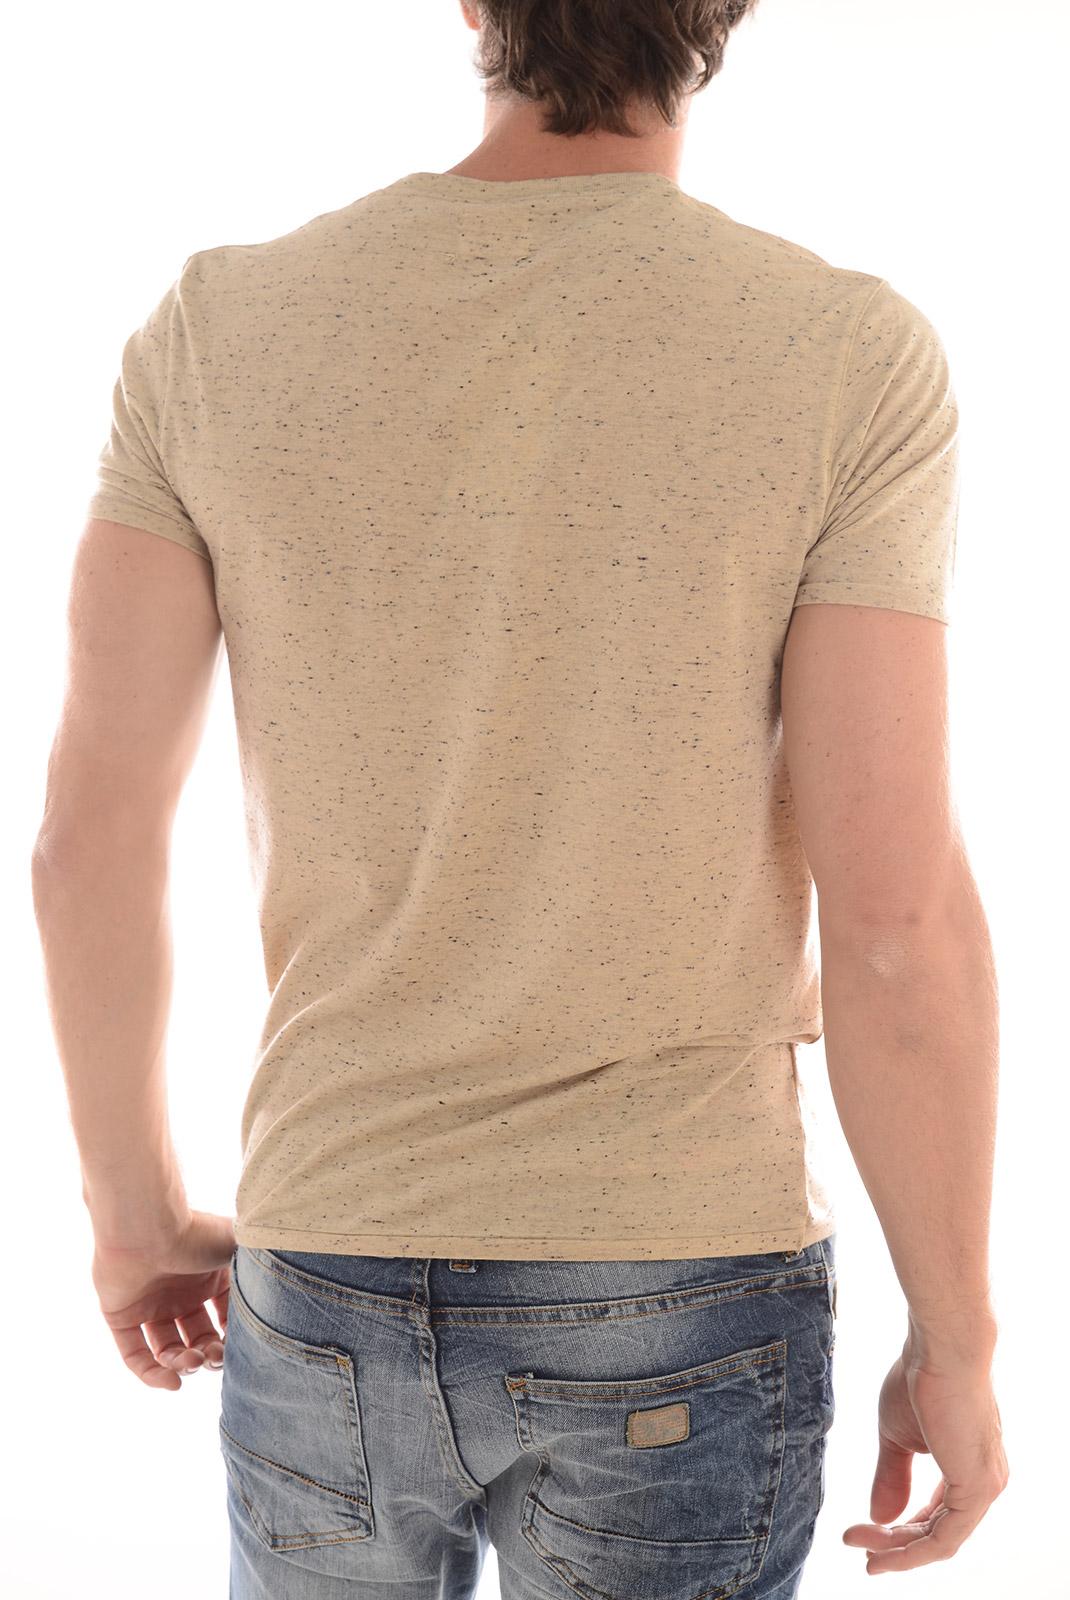 Tee-shirts  Selected SYMBOL SS O NECK LIGHT SAND MELANGE